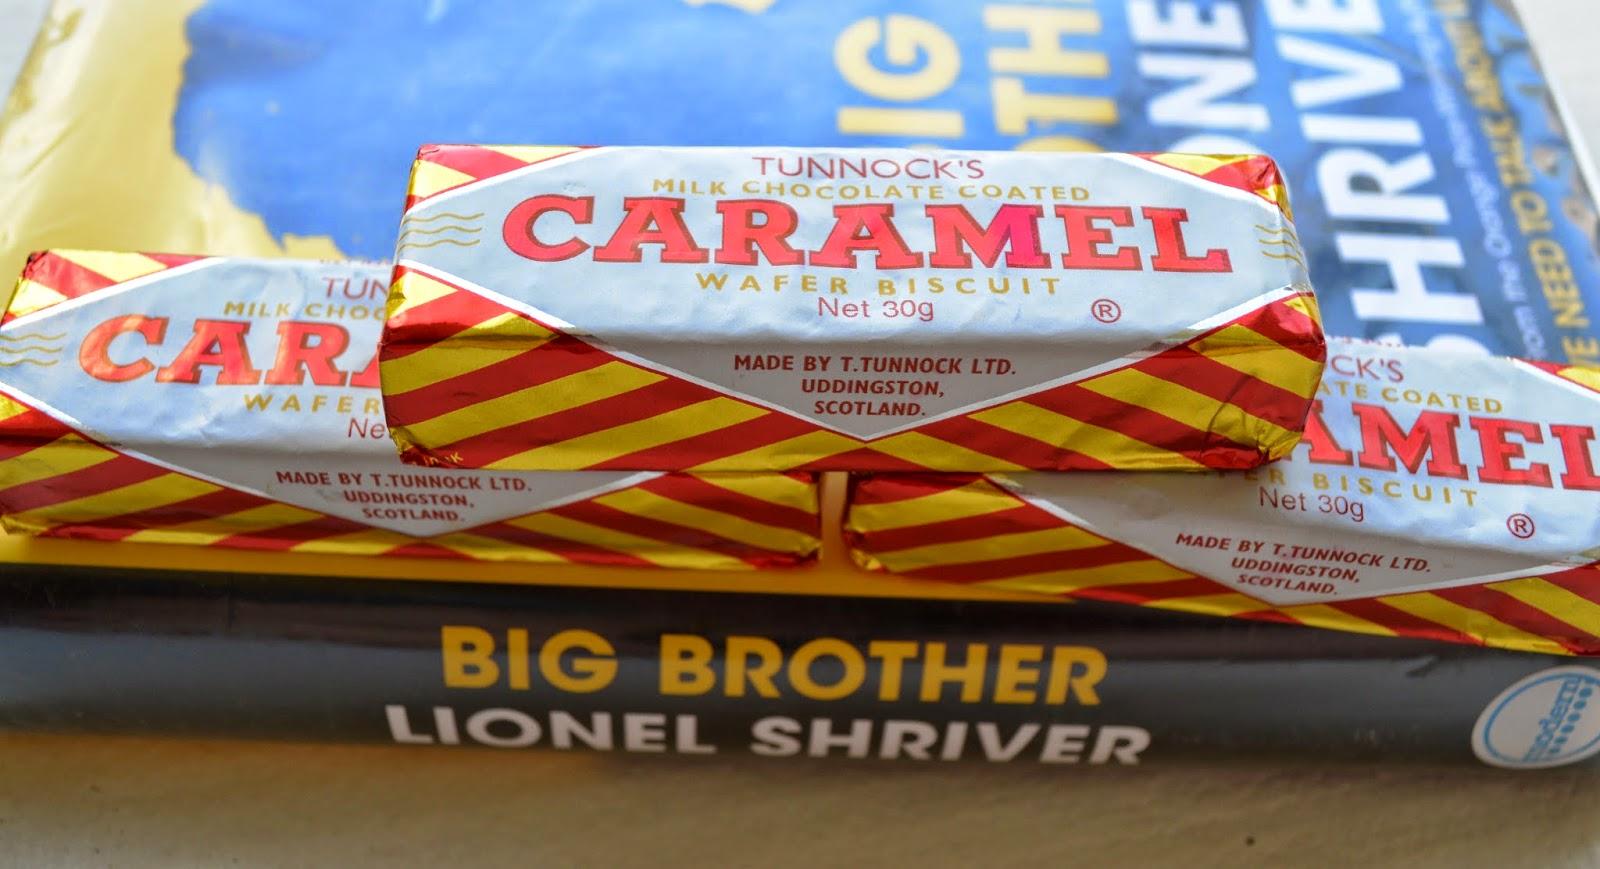 Lionel Shriver, Big Brother, book review, contemporary literature, novel, obesity, fat, hardback